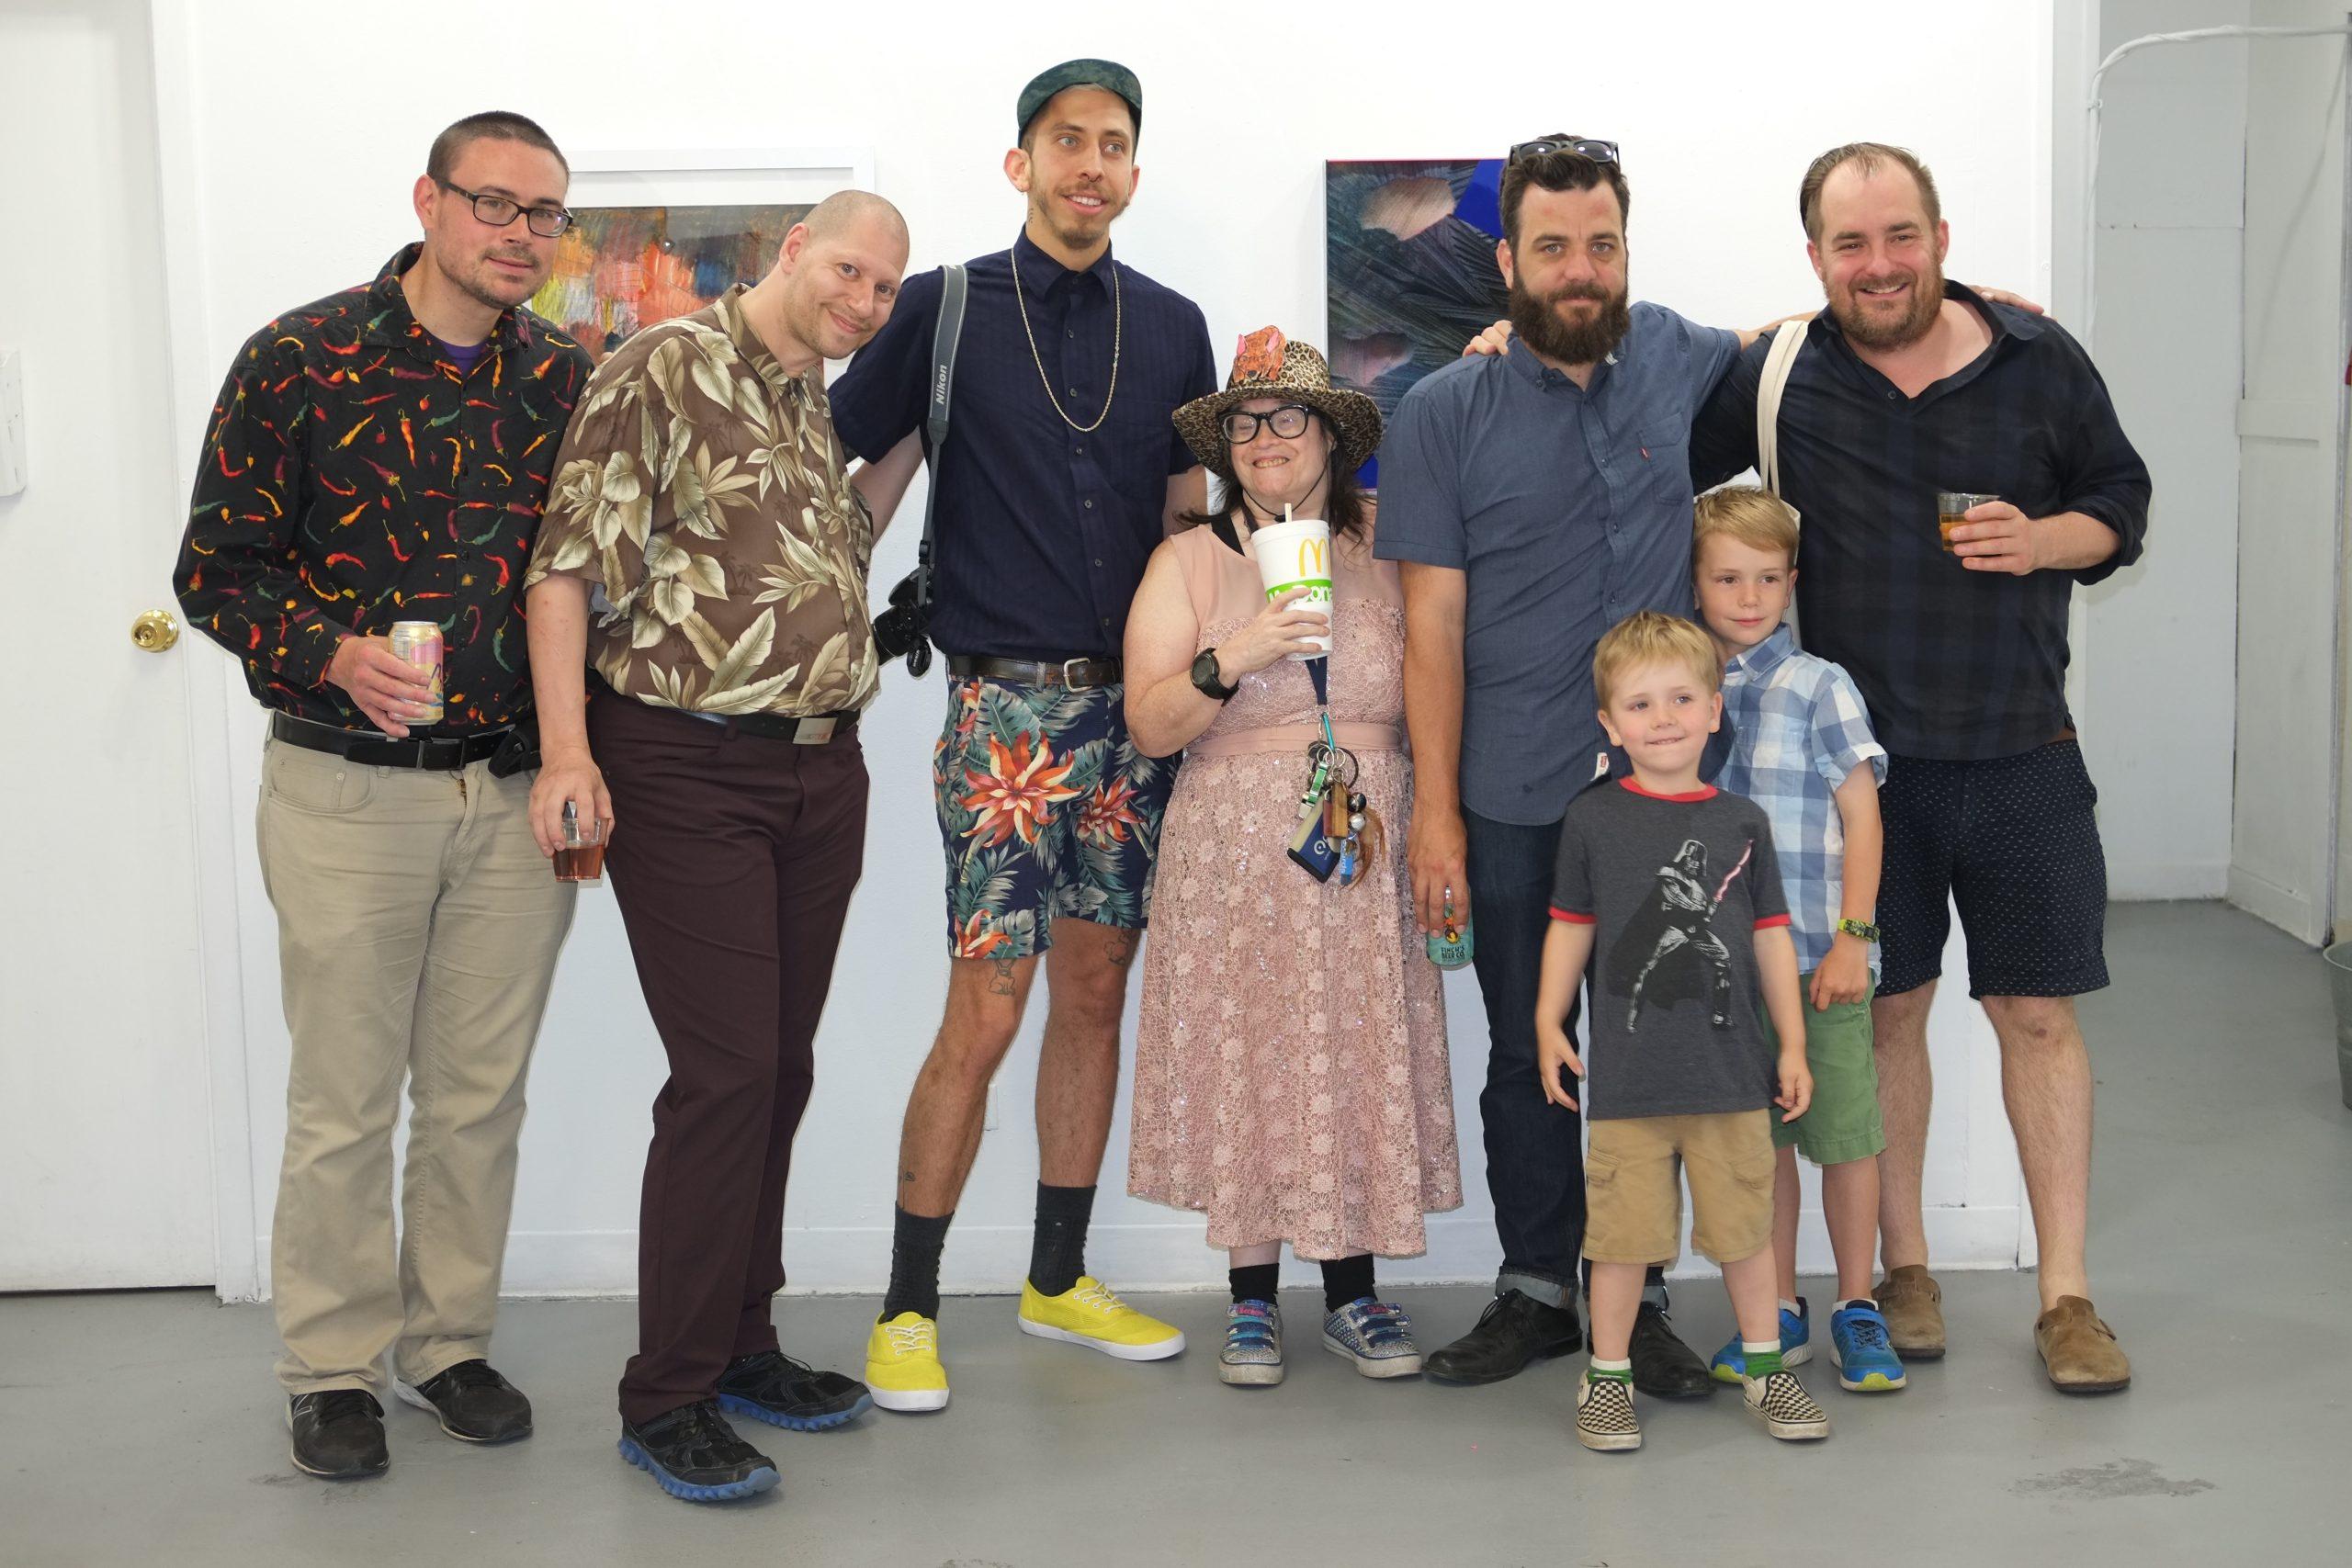 Tim Stone, Kris Shenkel, Vincent Uribe, Jean Wilson, Zachary Buchner and his kids, and Andrew Rafacz